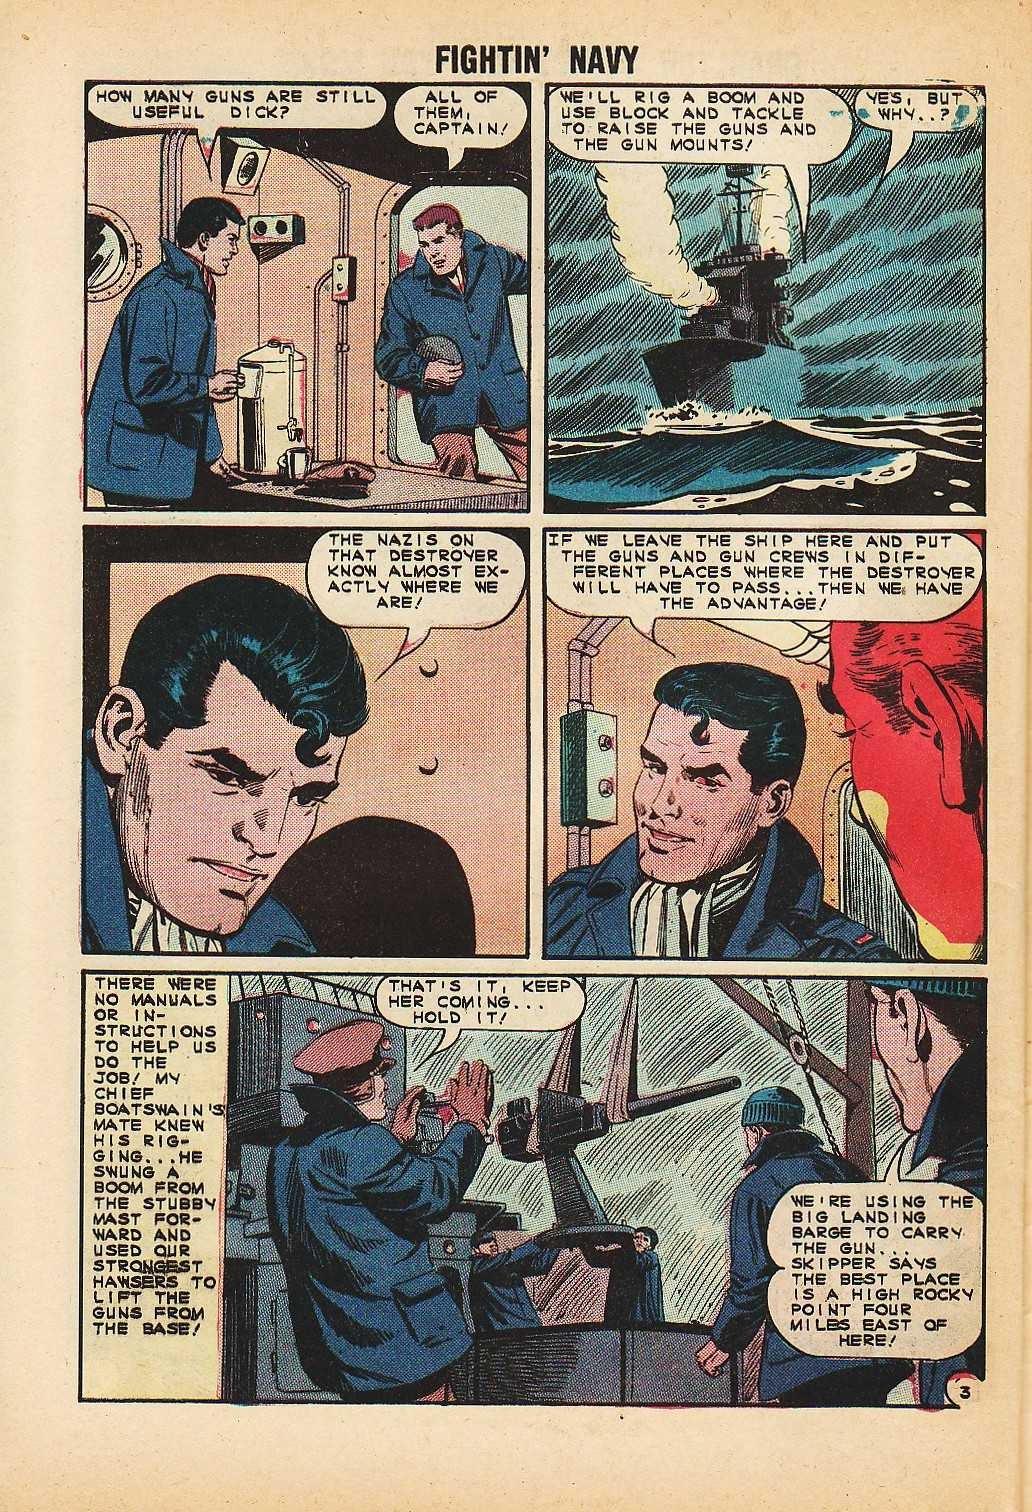 Read online Fightin' Navy comic -  Issue #116 - 28